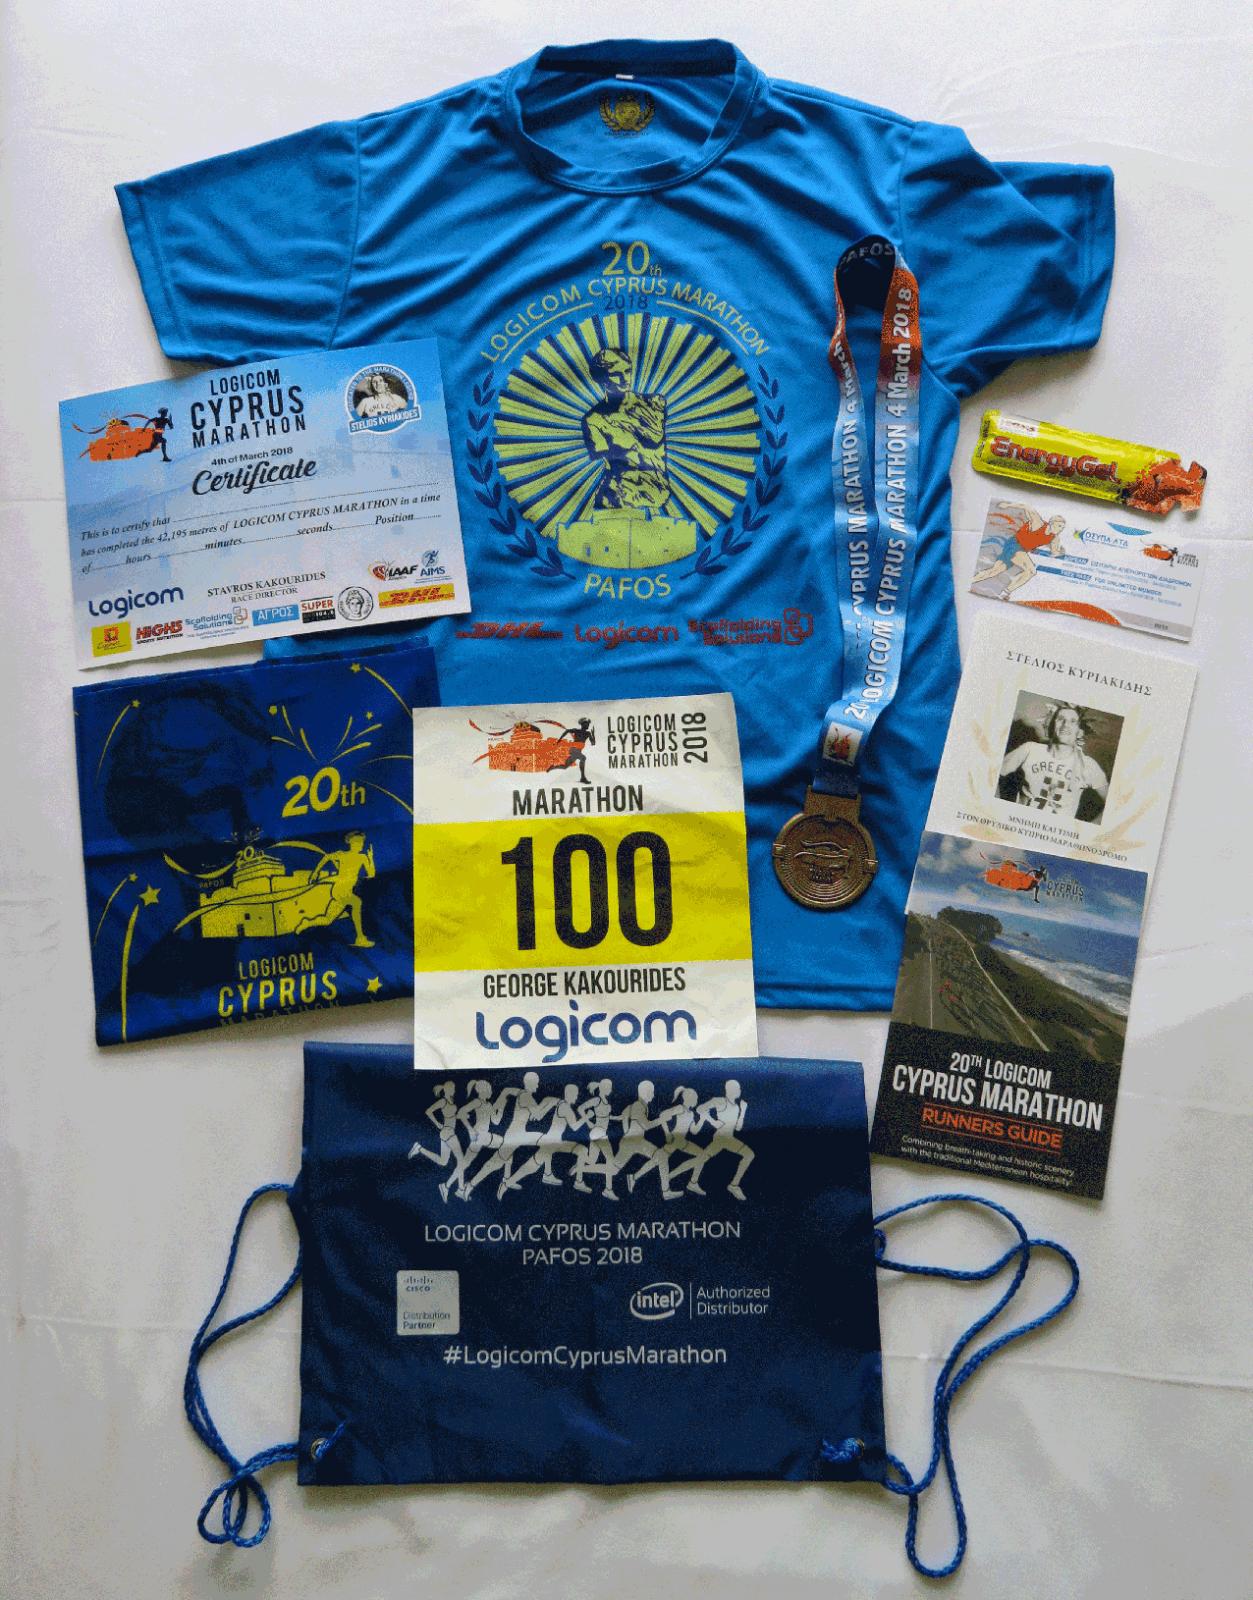 Logicom Cyprus Marathon 5